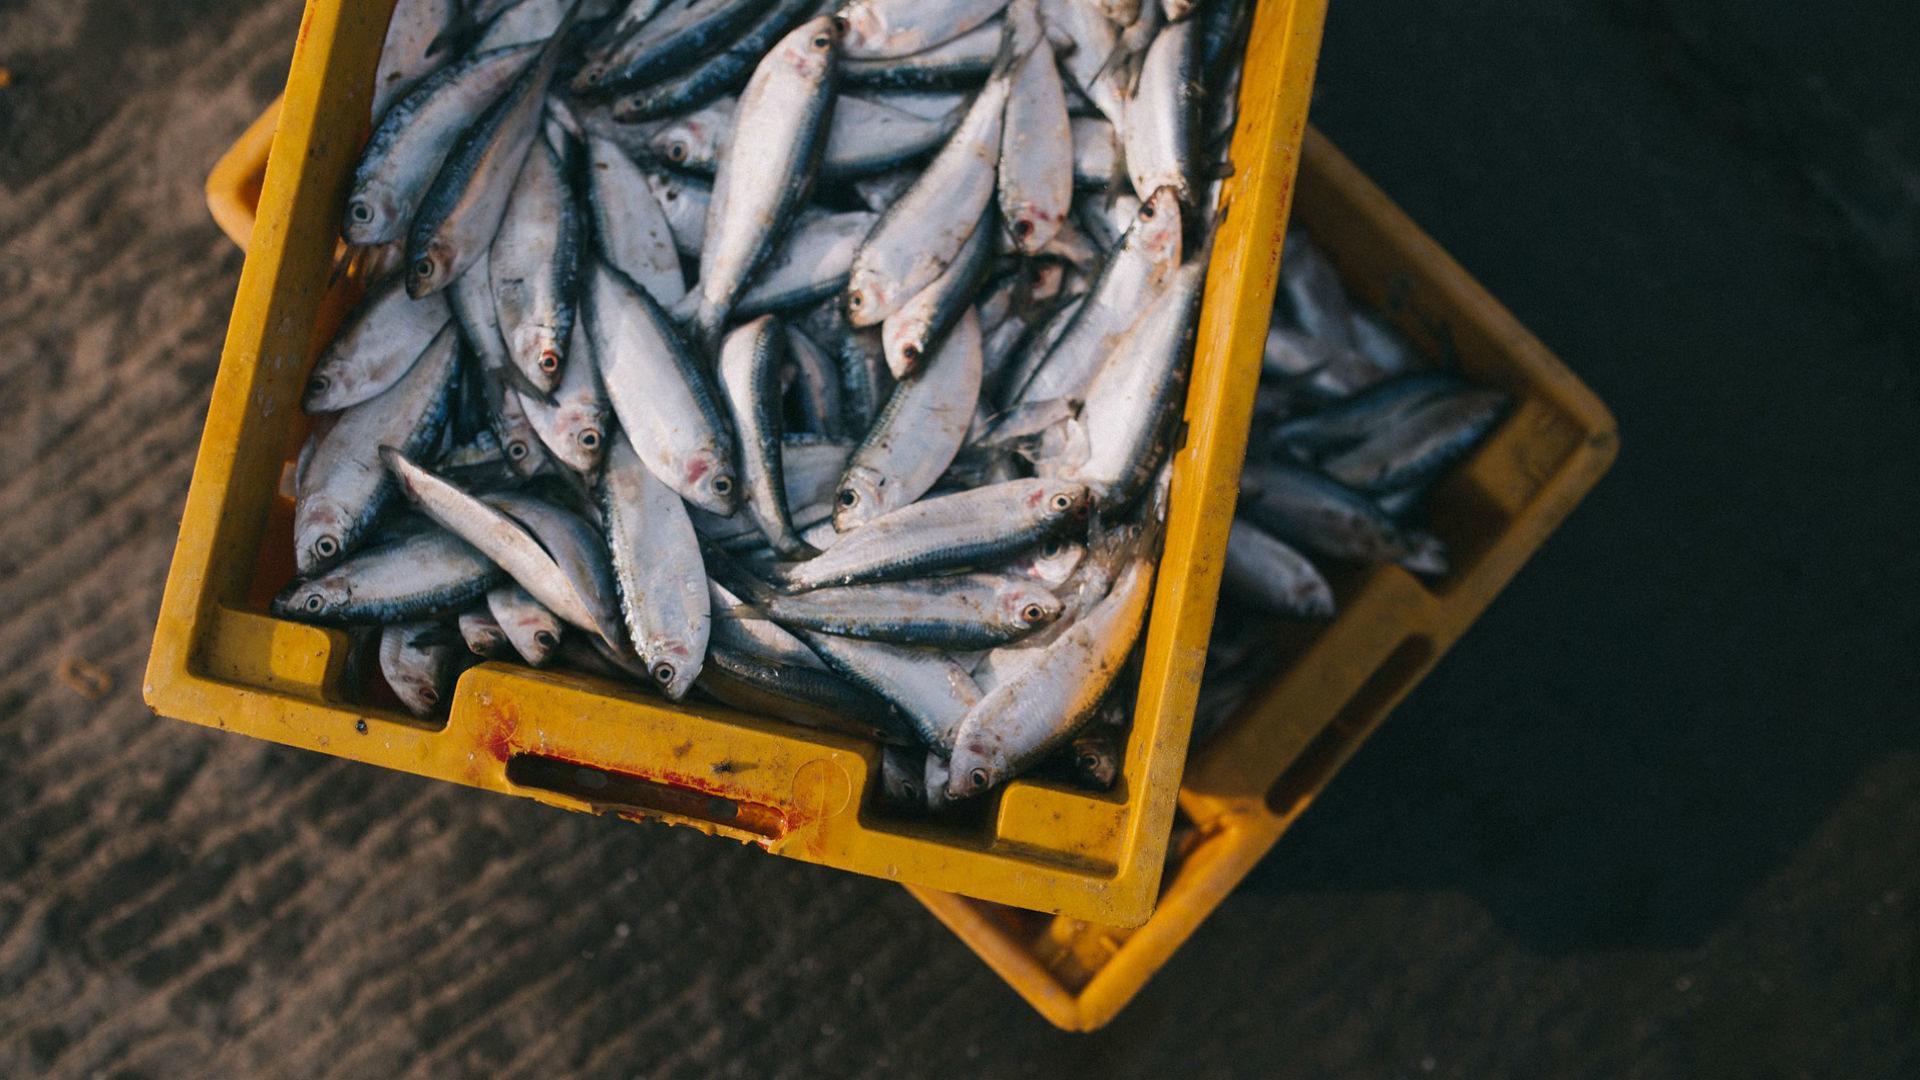 Suatainable fishing